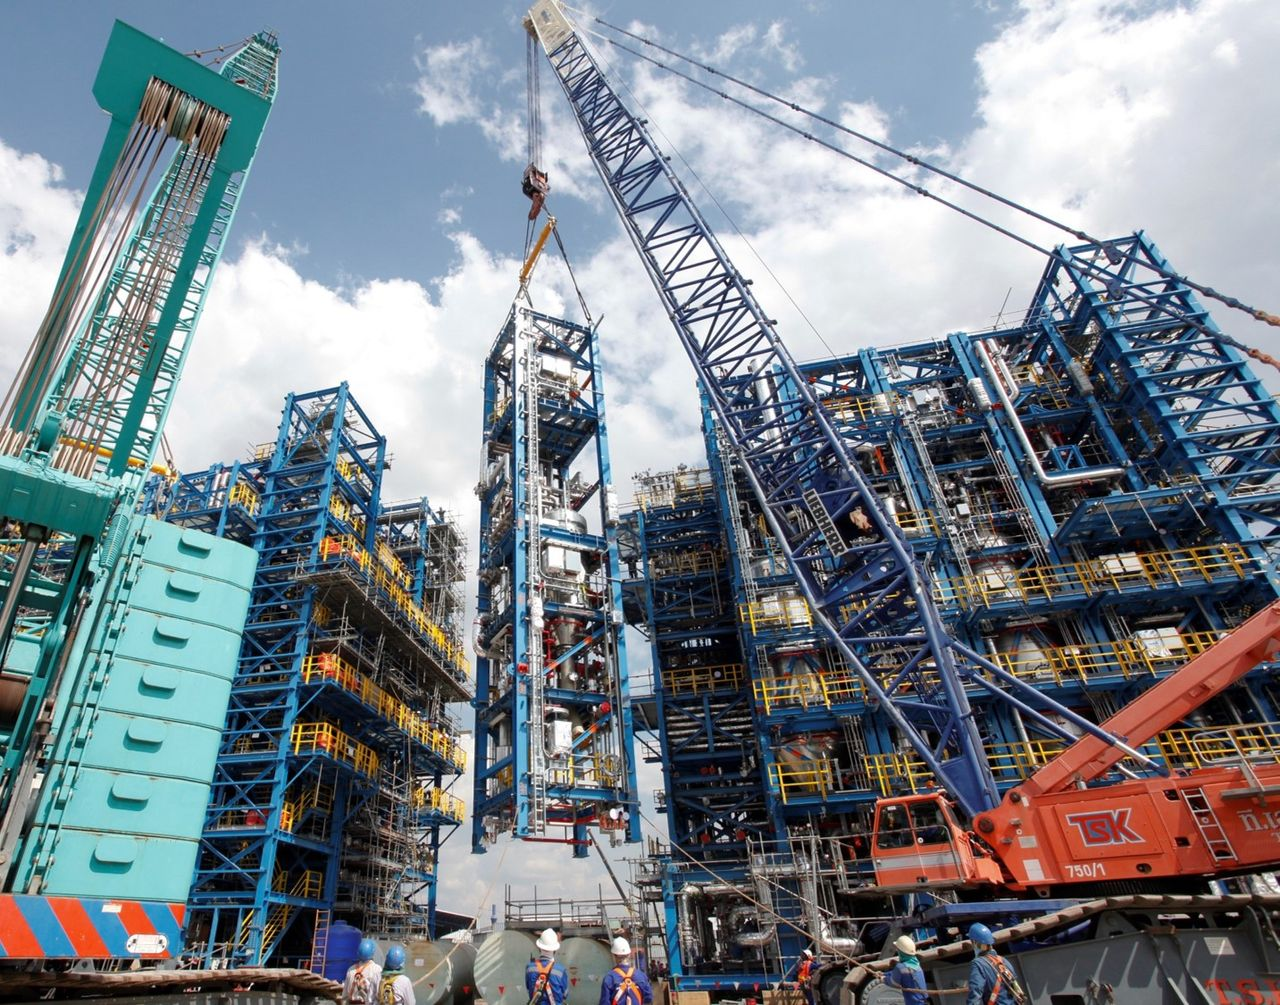 Design, Fabrication, Construction, Operations & Maintenance